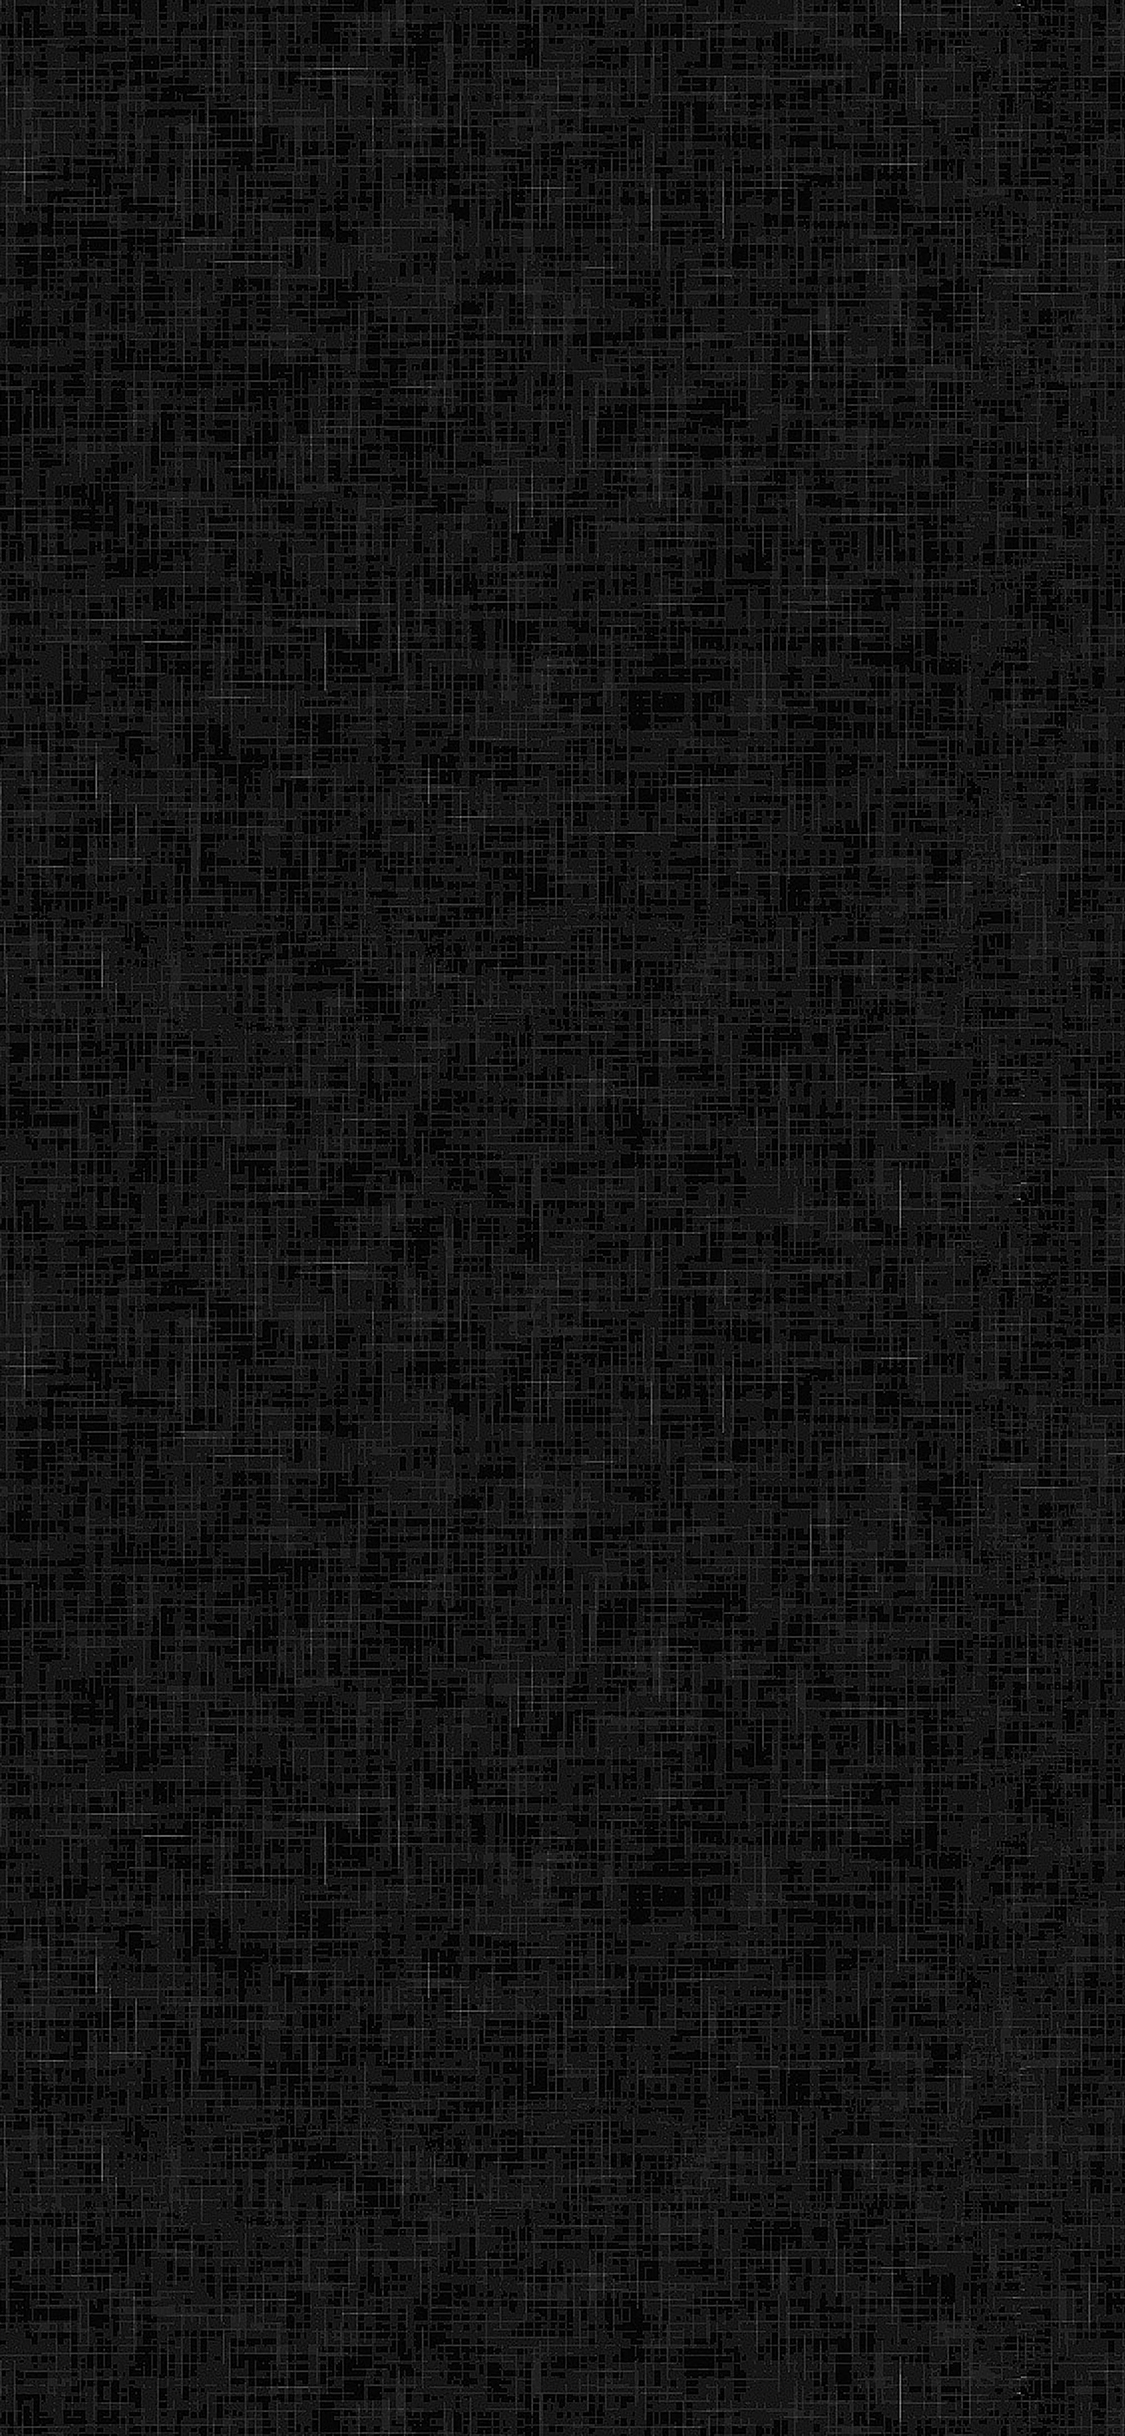 iPhoneXpapers.com-Apple-iPhone-wallpaper-vb38-wallpaper-furly-black-pattern-texture